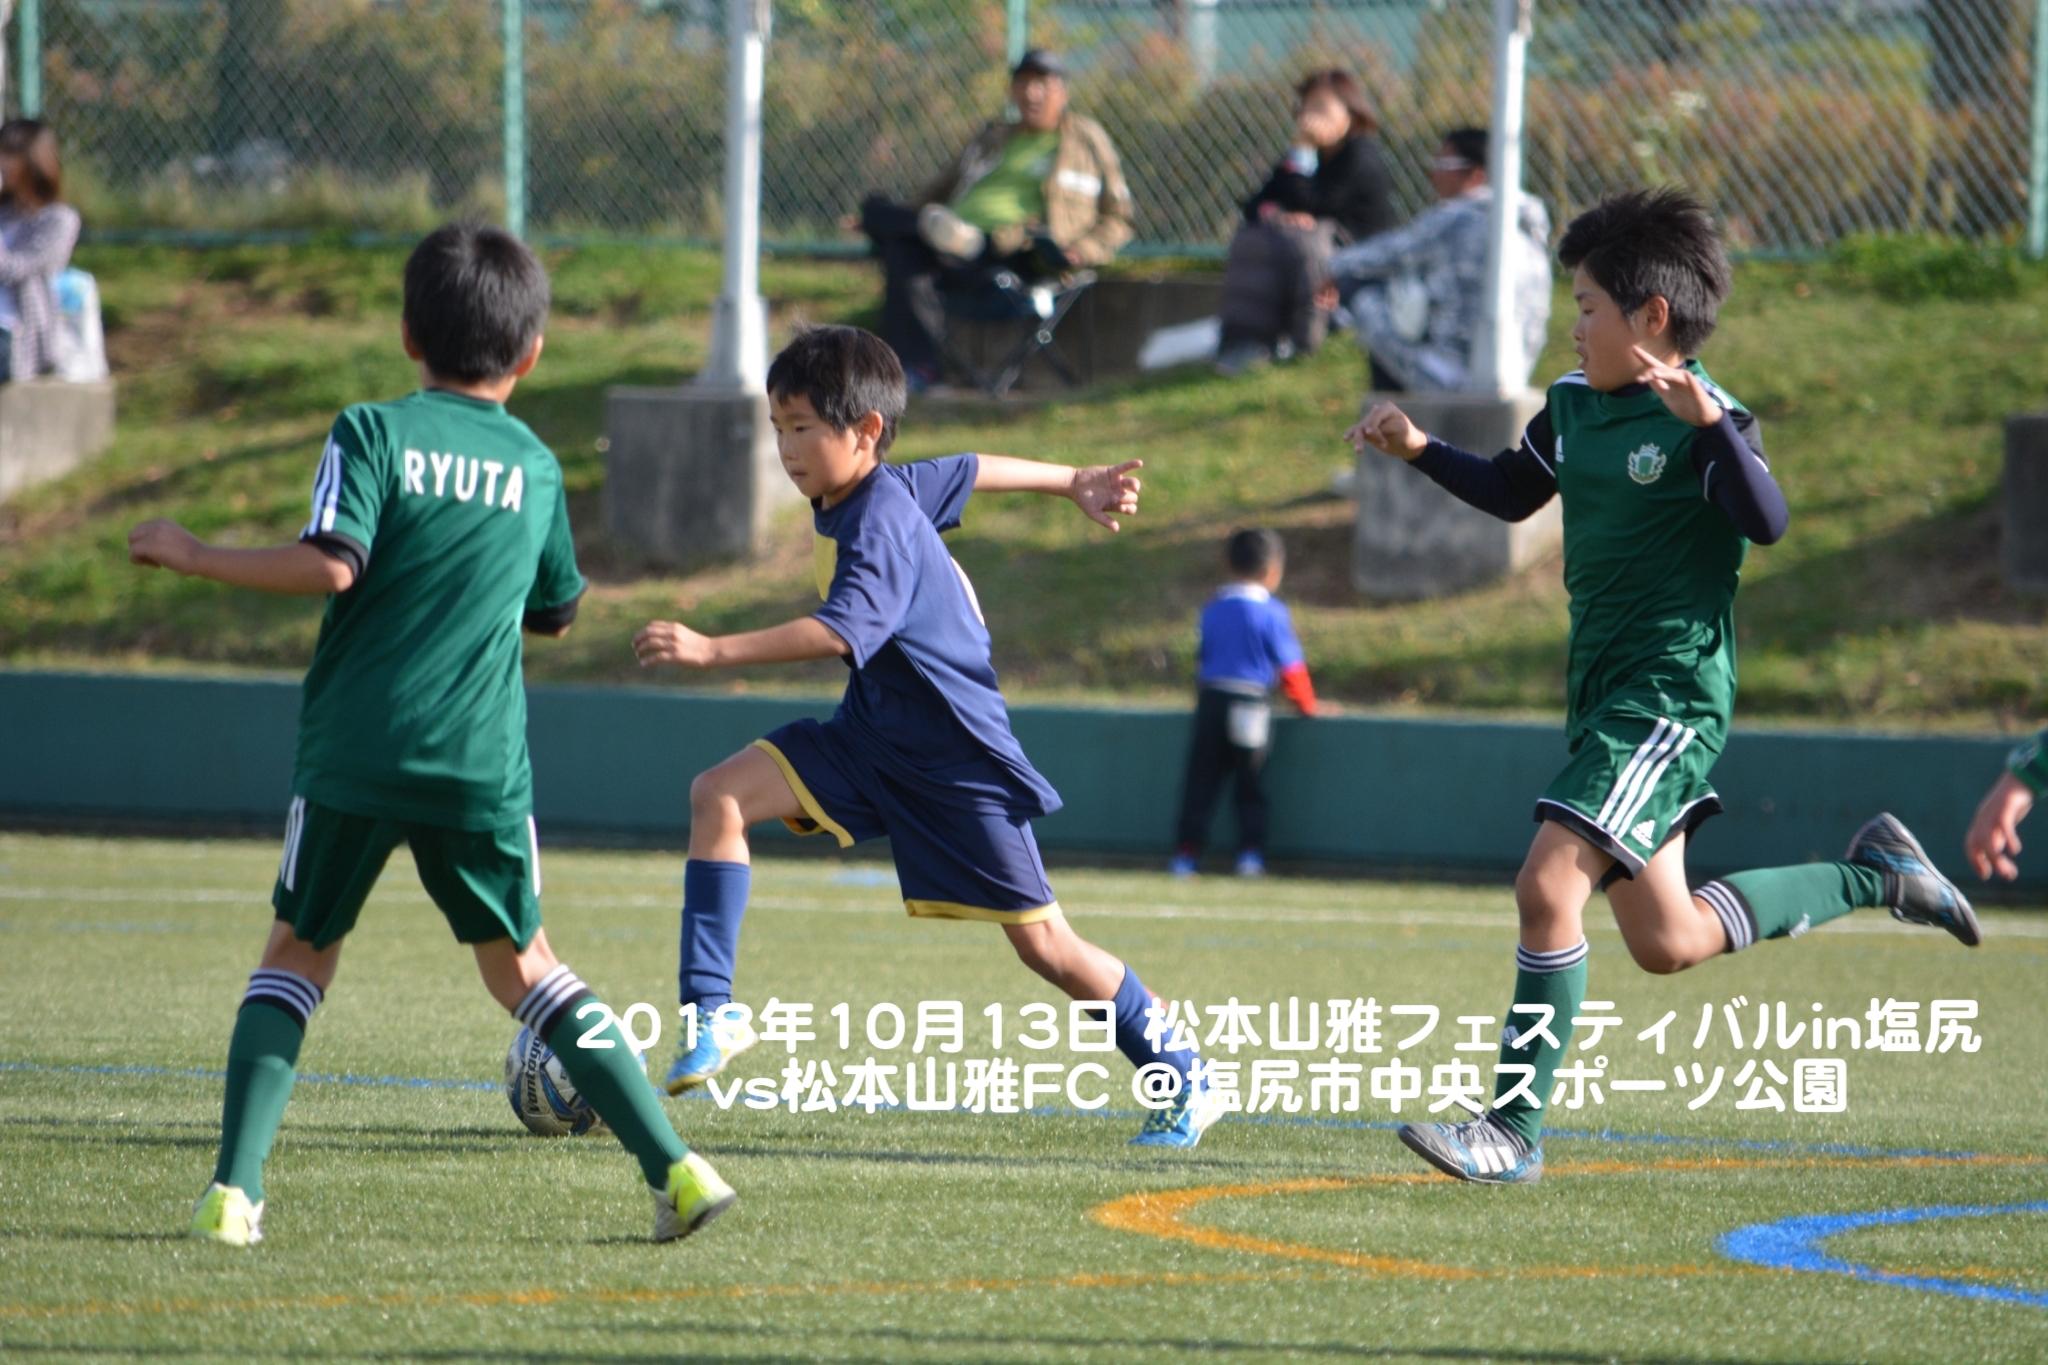 181013 松本山雅 in 塩尻_181015_0060